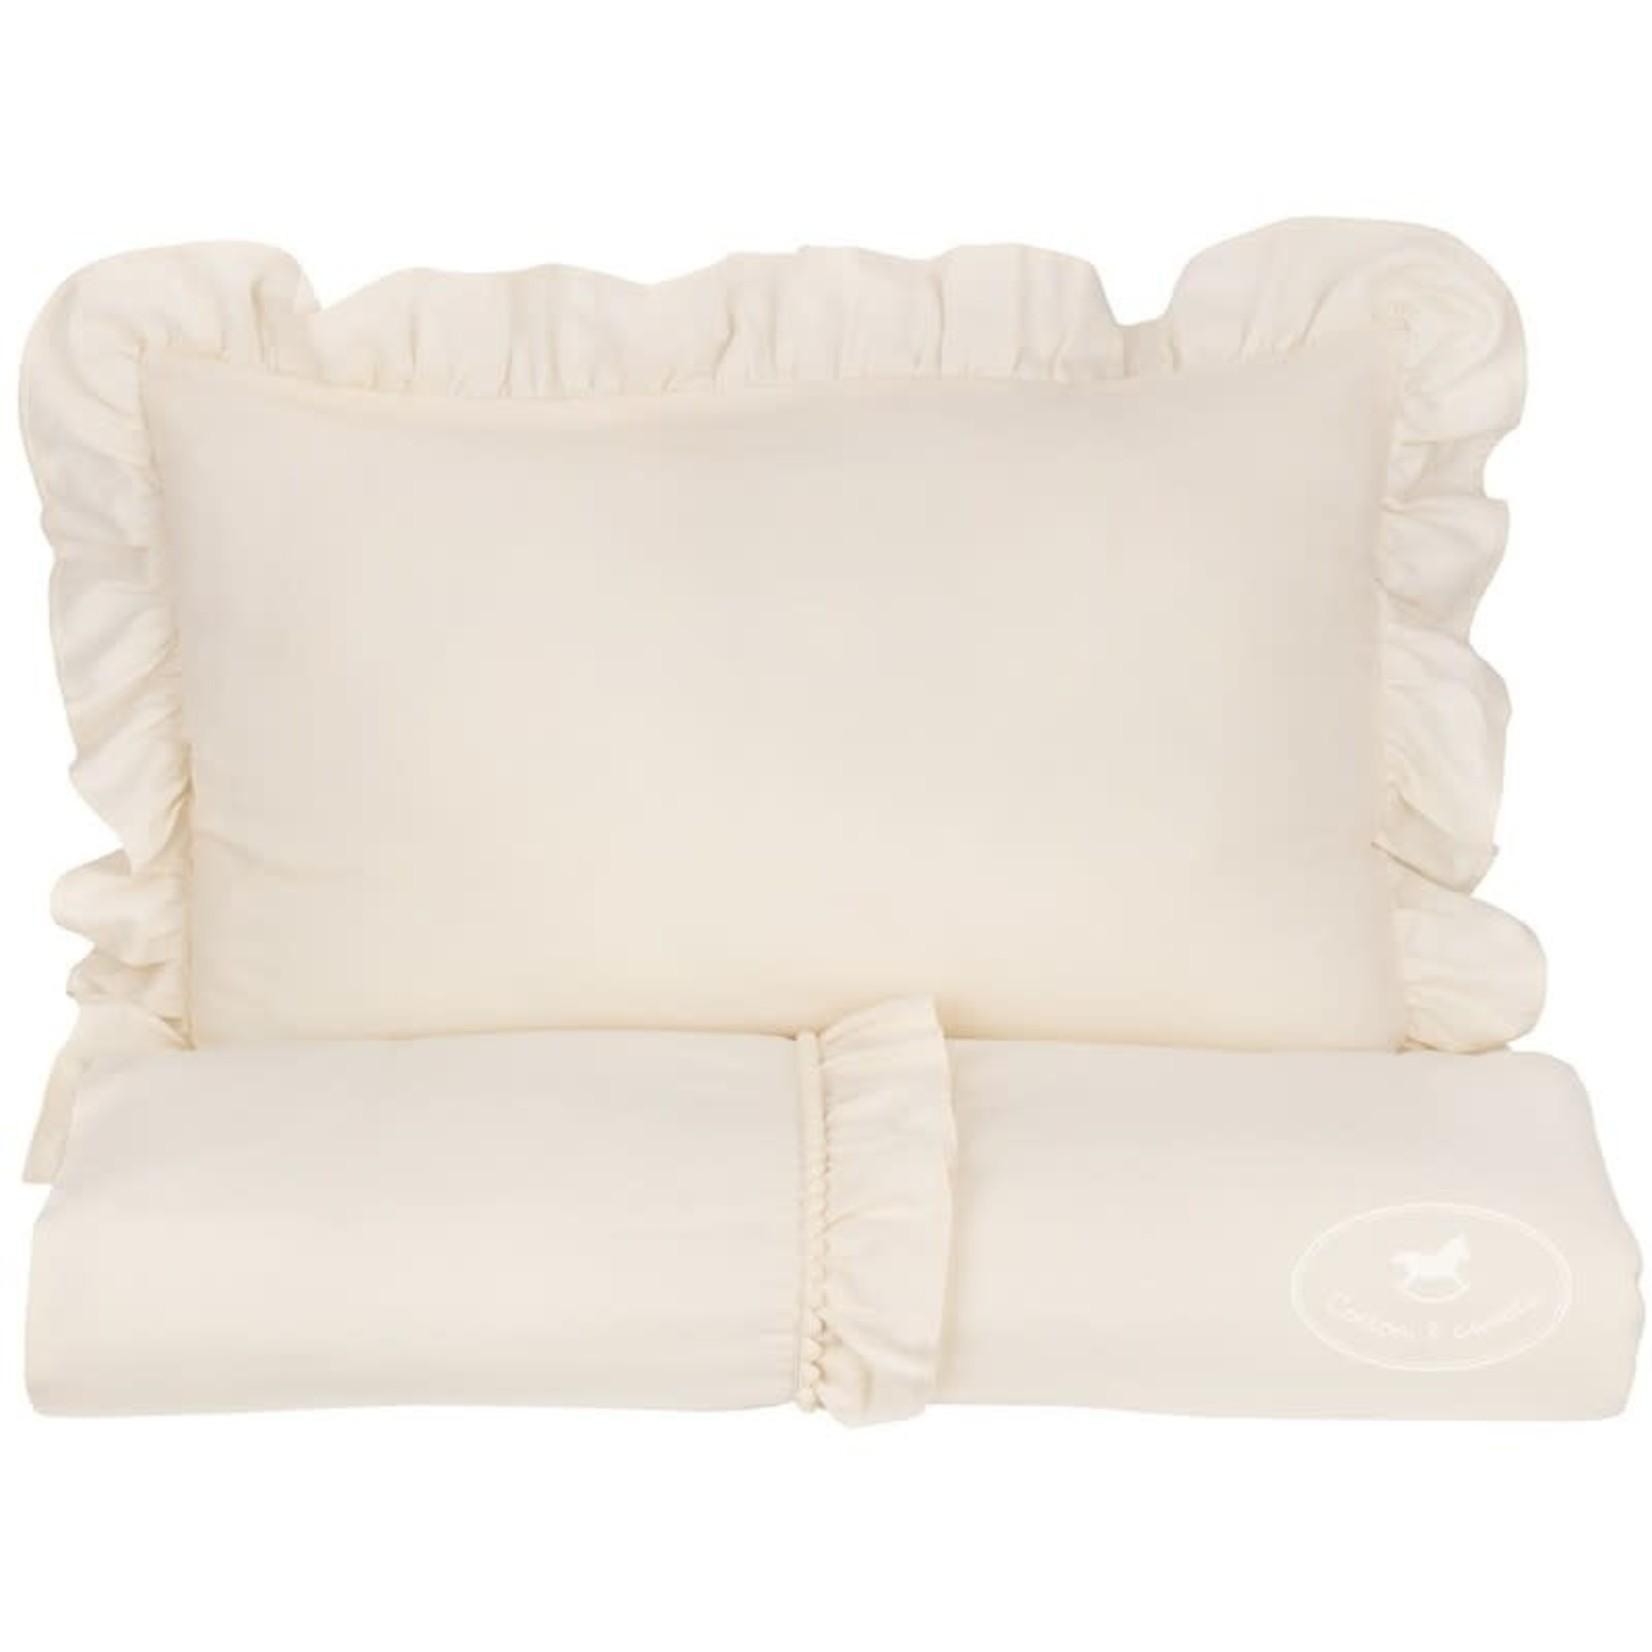 Cotton & Sweets Sheet Boho Offwhite